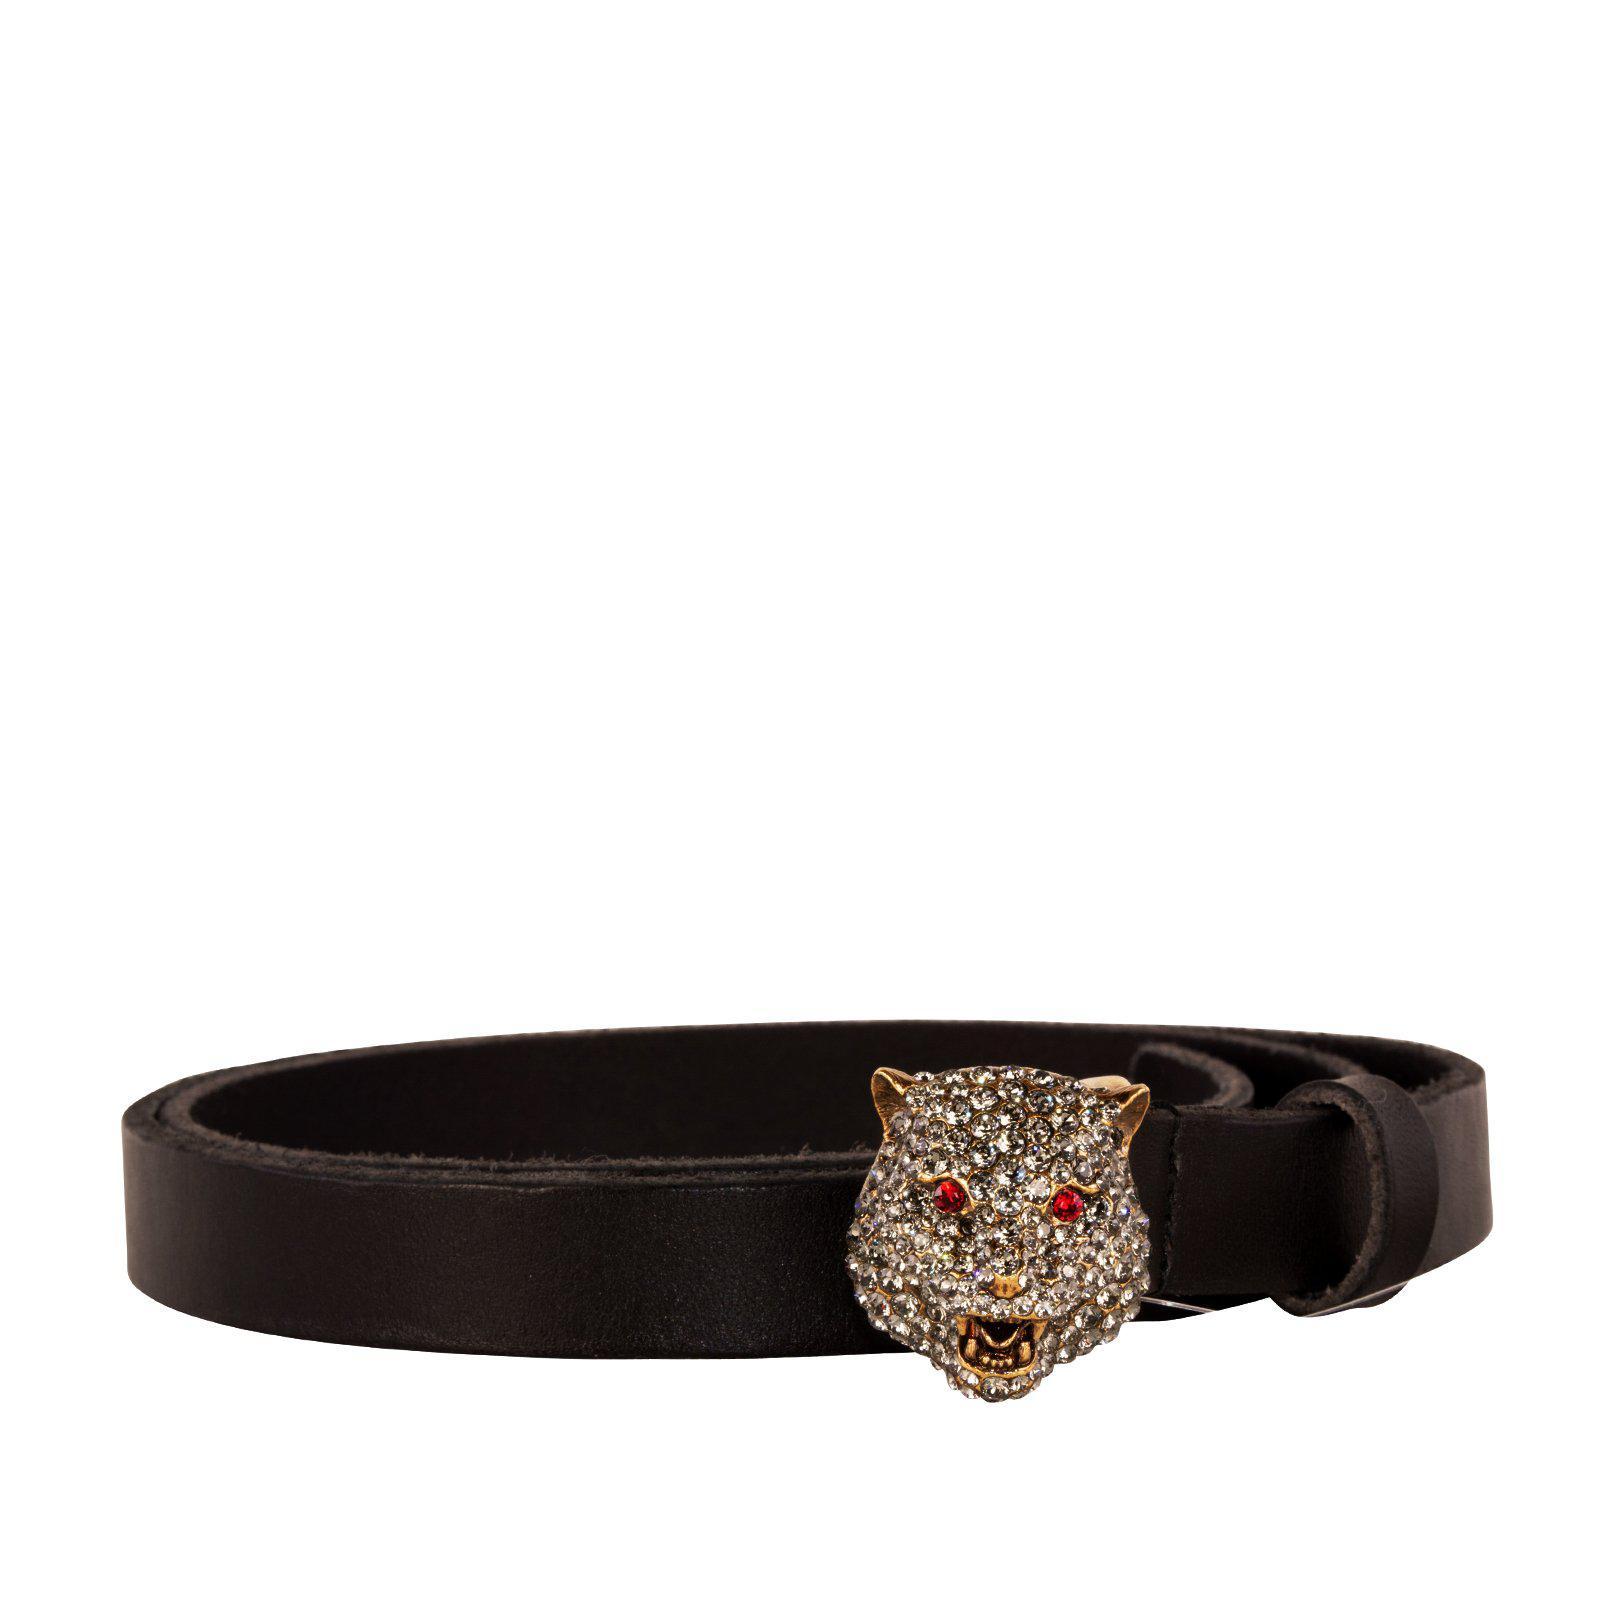 942b2c86f2c Gucci Tiger Buckle Belt in Black - Lyst